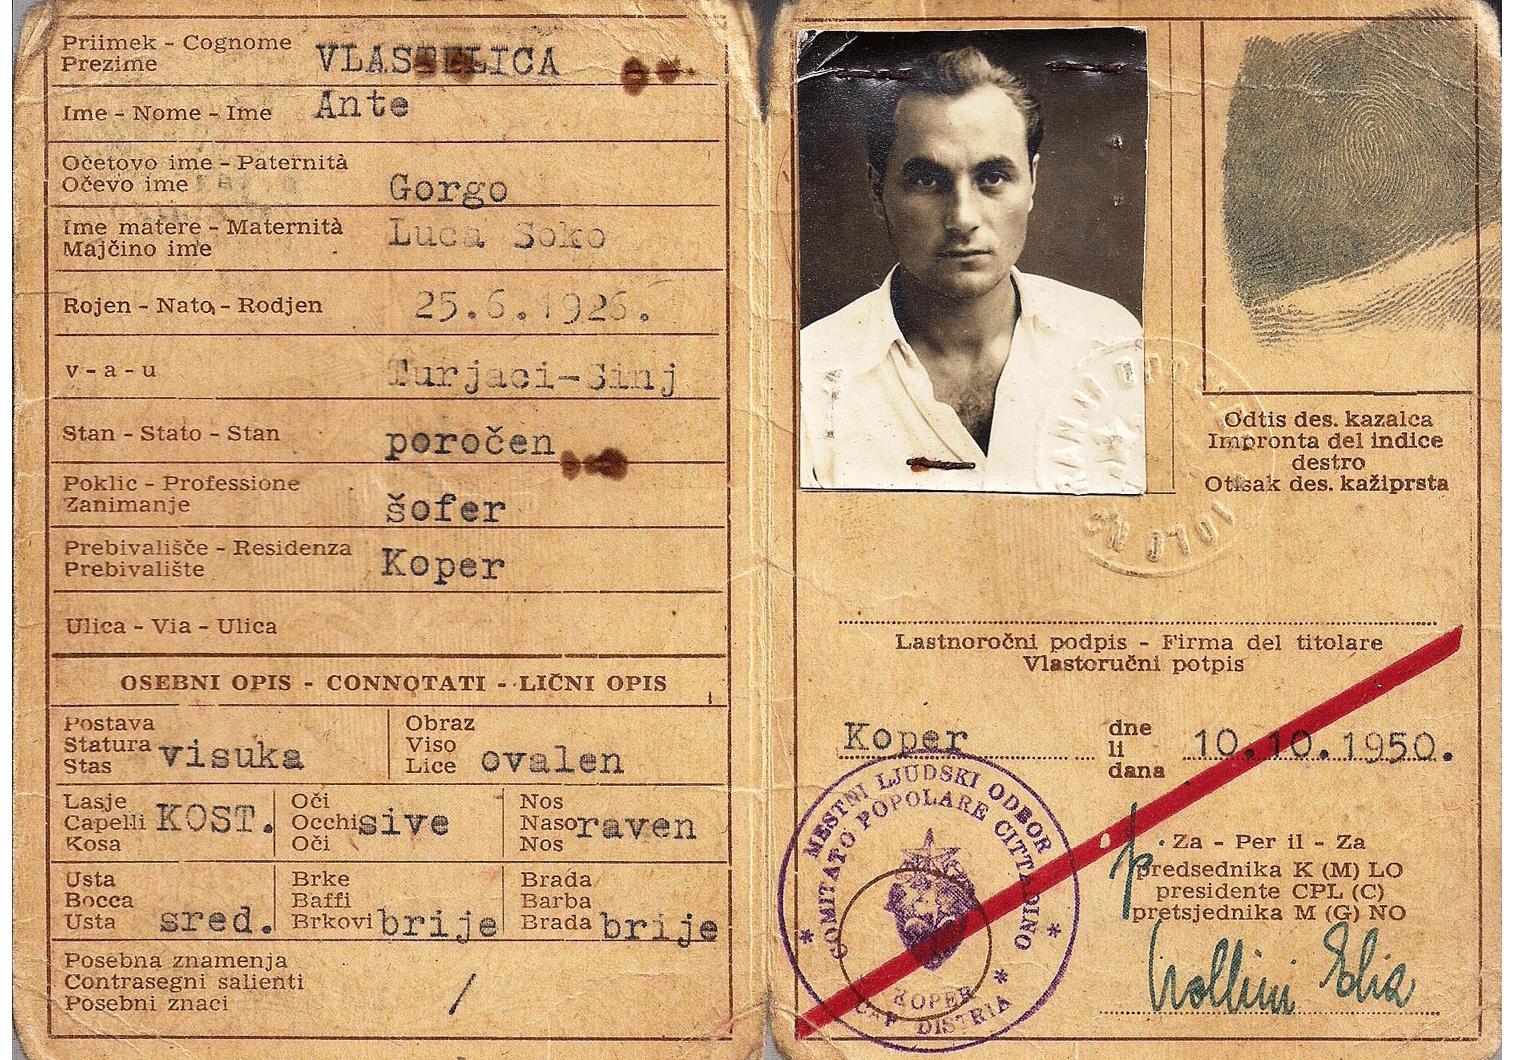 Free Territory of Trieste ID